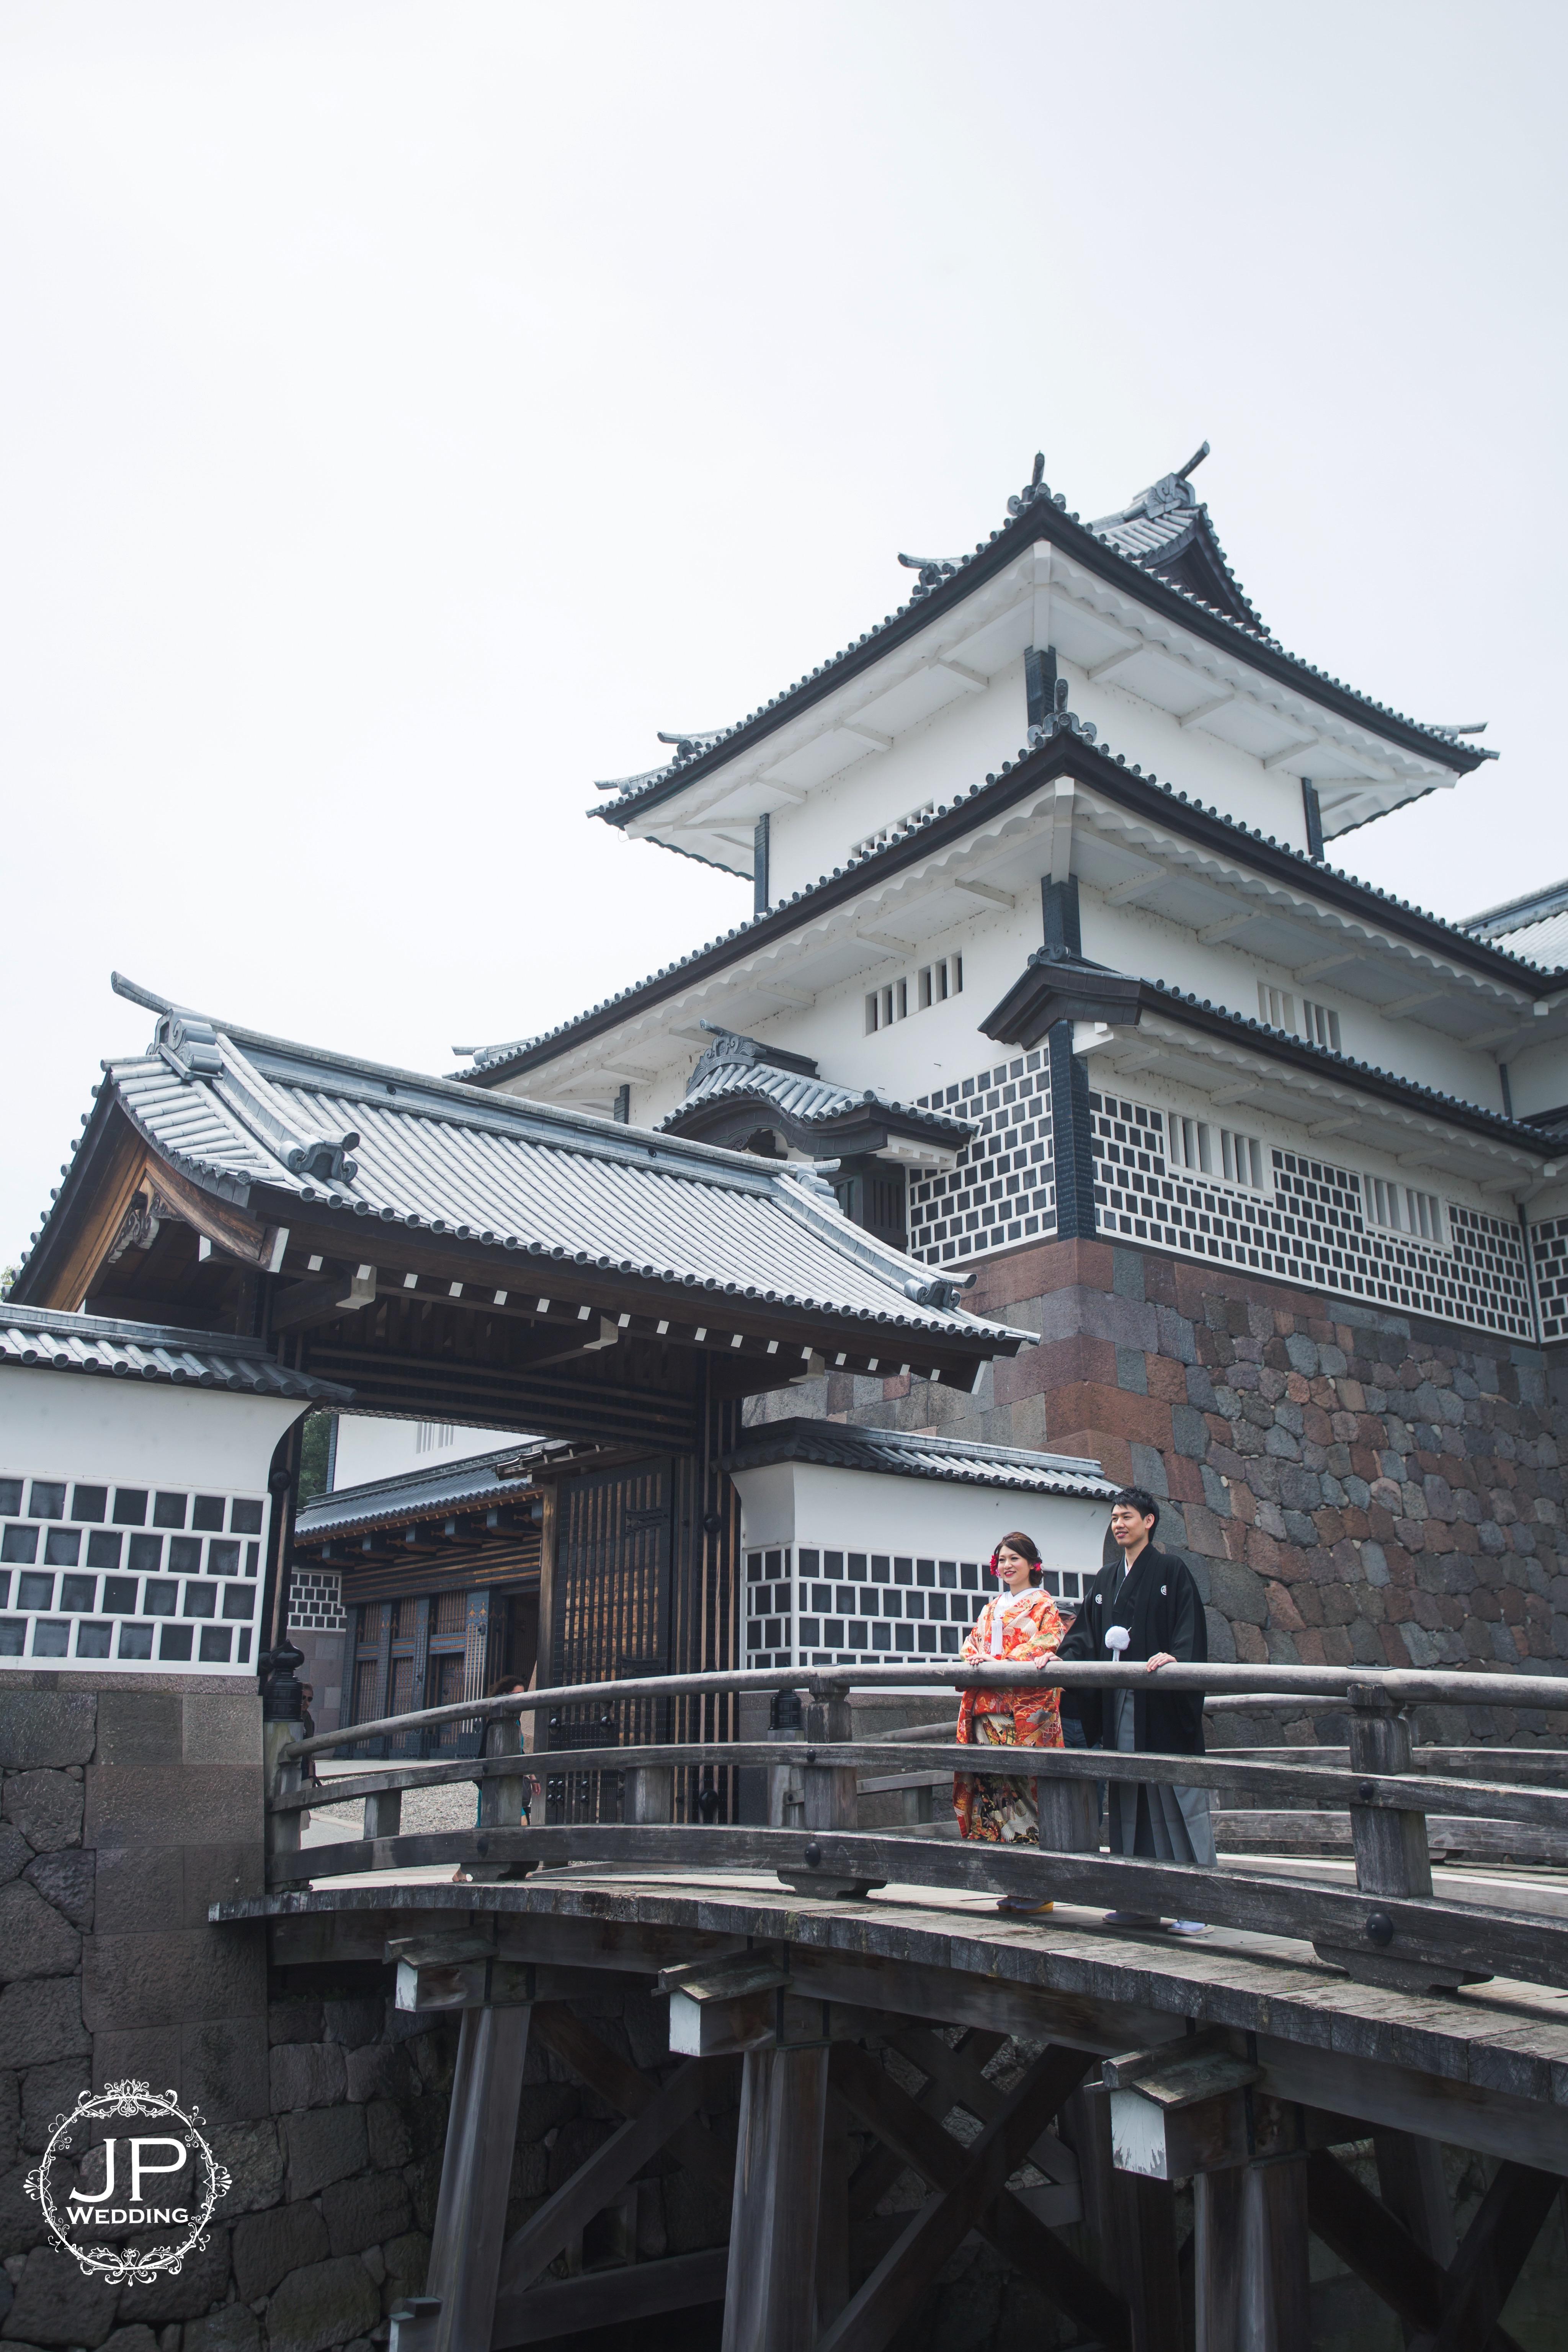 Japan Prewedding Photoshoot- JP Wedding-5